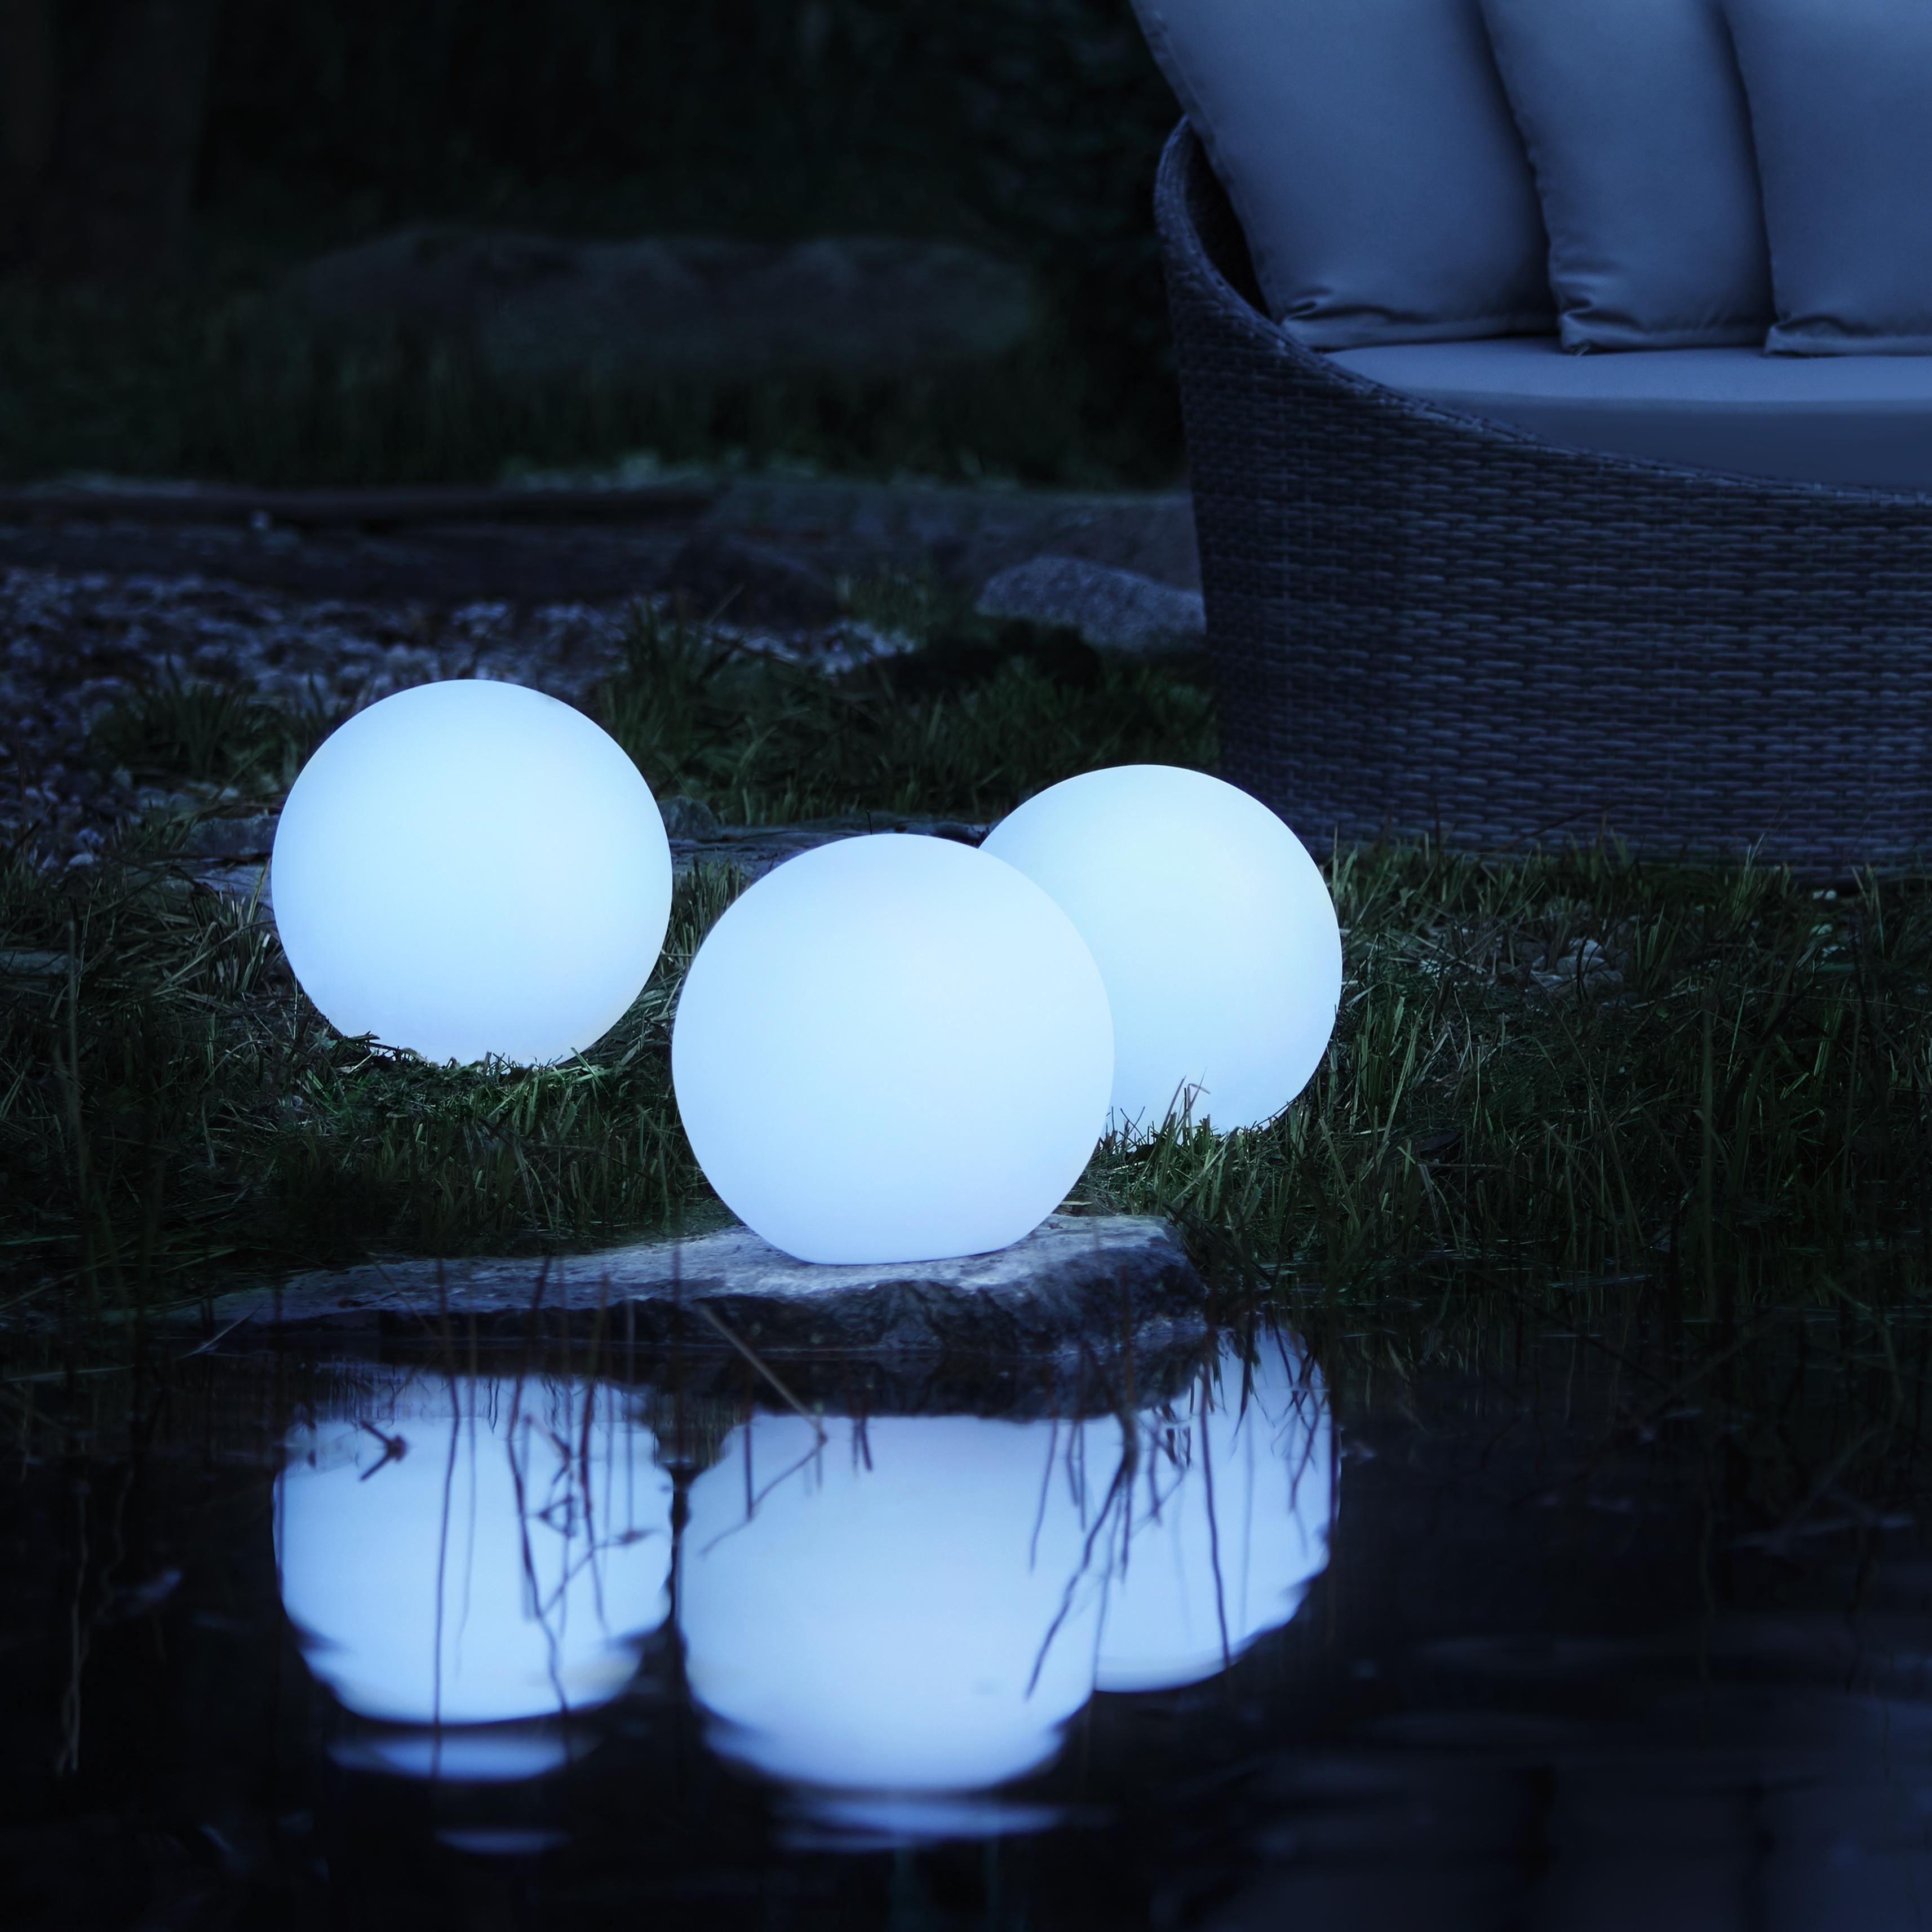 Gartenleuchte Led Solar Ben Ø ca. 30 cm - Weiß, MODERN, Kunststoff (30/30cm) - Modern Living